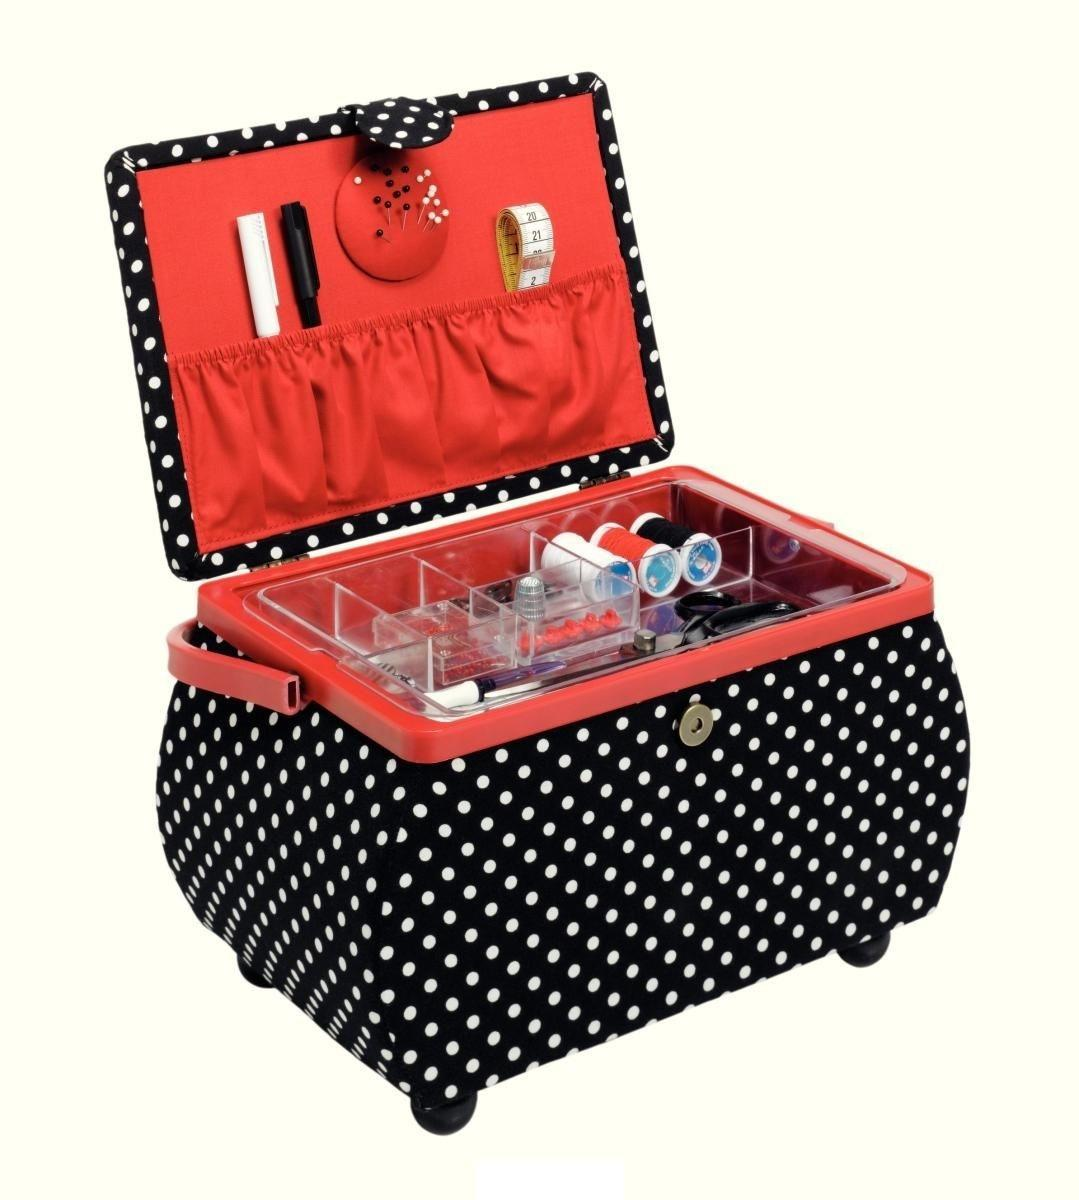 Шкатулка для рукоделия Polka dots (Горошек), цвет: черный, белый, красный, 32 х 20,5 х 20 см шкатулка для рукоделия bestex цветы 23 х 18 х 12 см